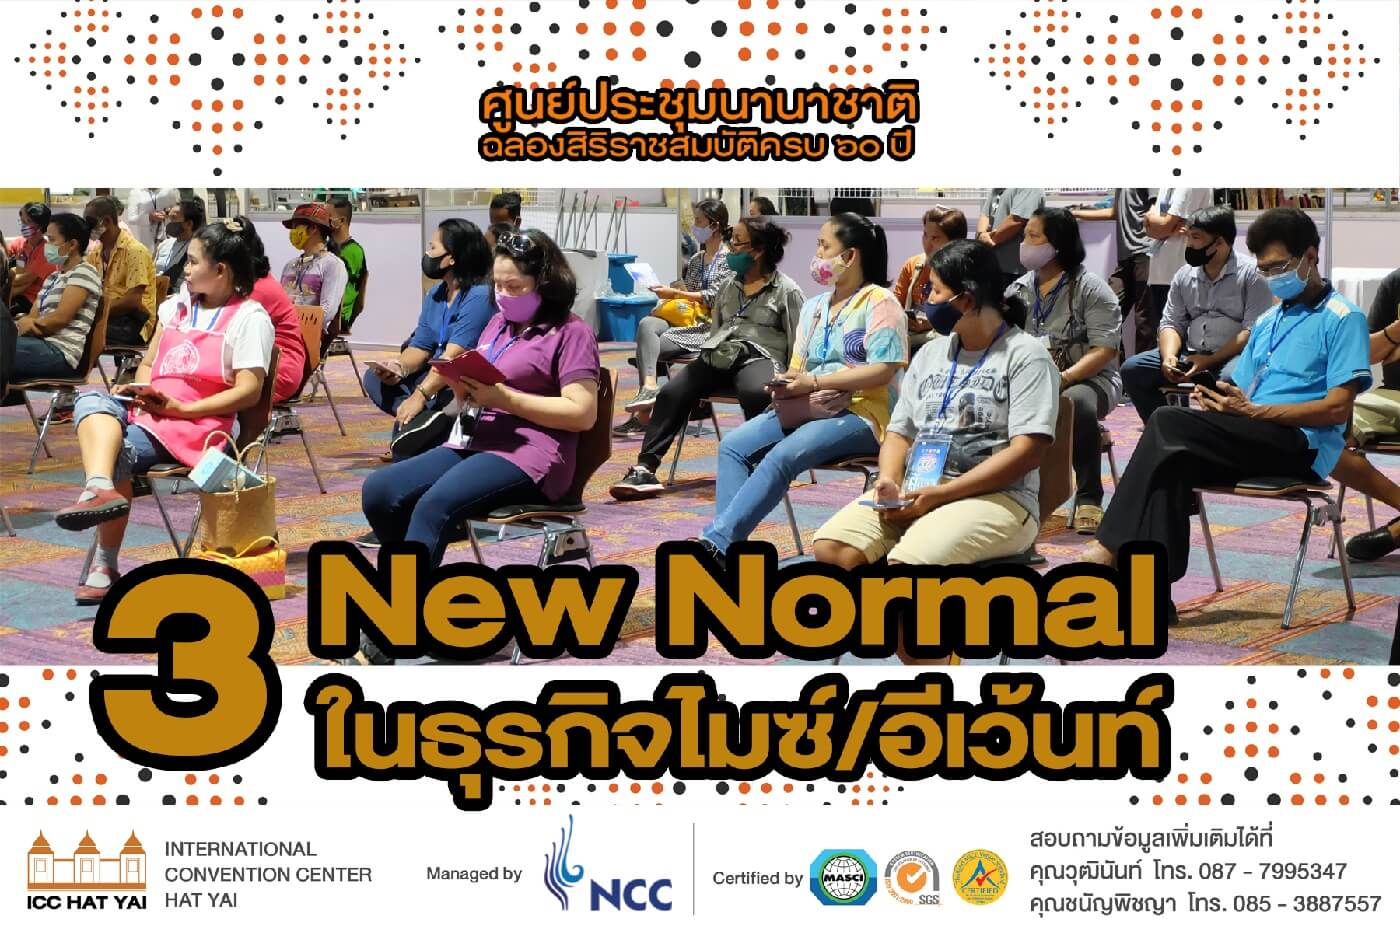 Web Cover 3 New Normal 1 ICC HATYAI ศูนย์ประชุมนานาชาติฉลองสิริราชสมบัติครบ ๖๐ ปี